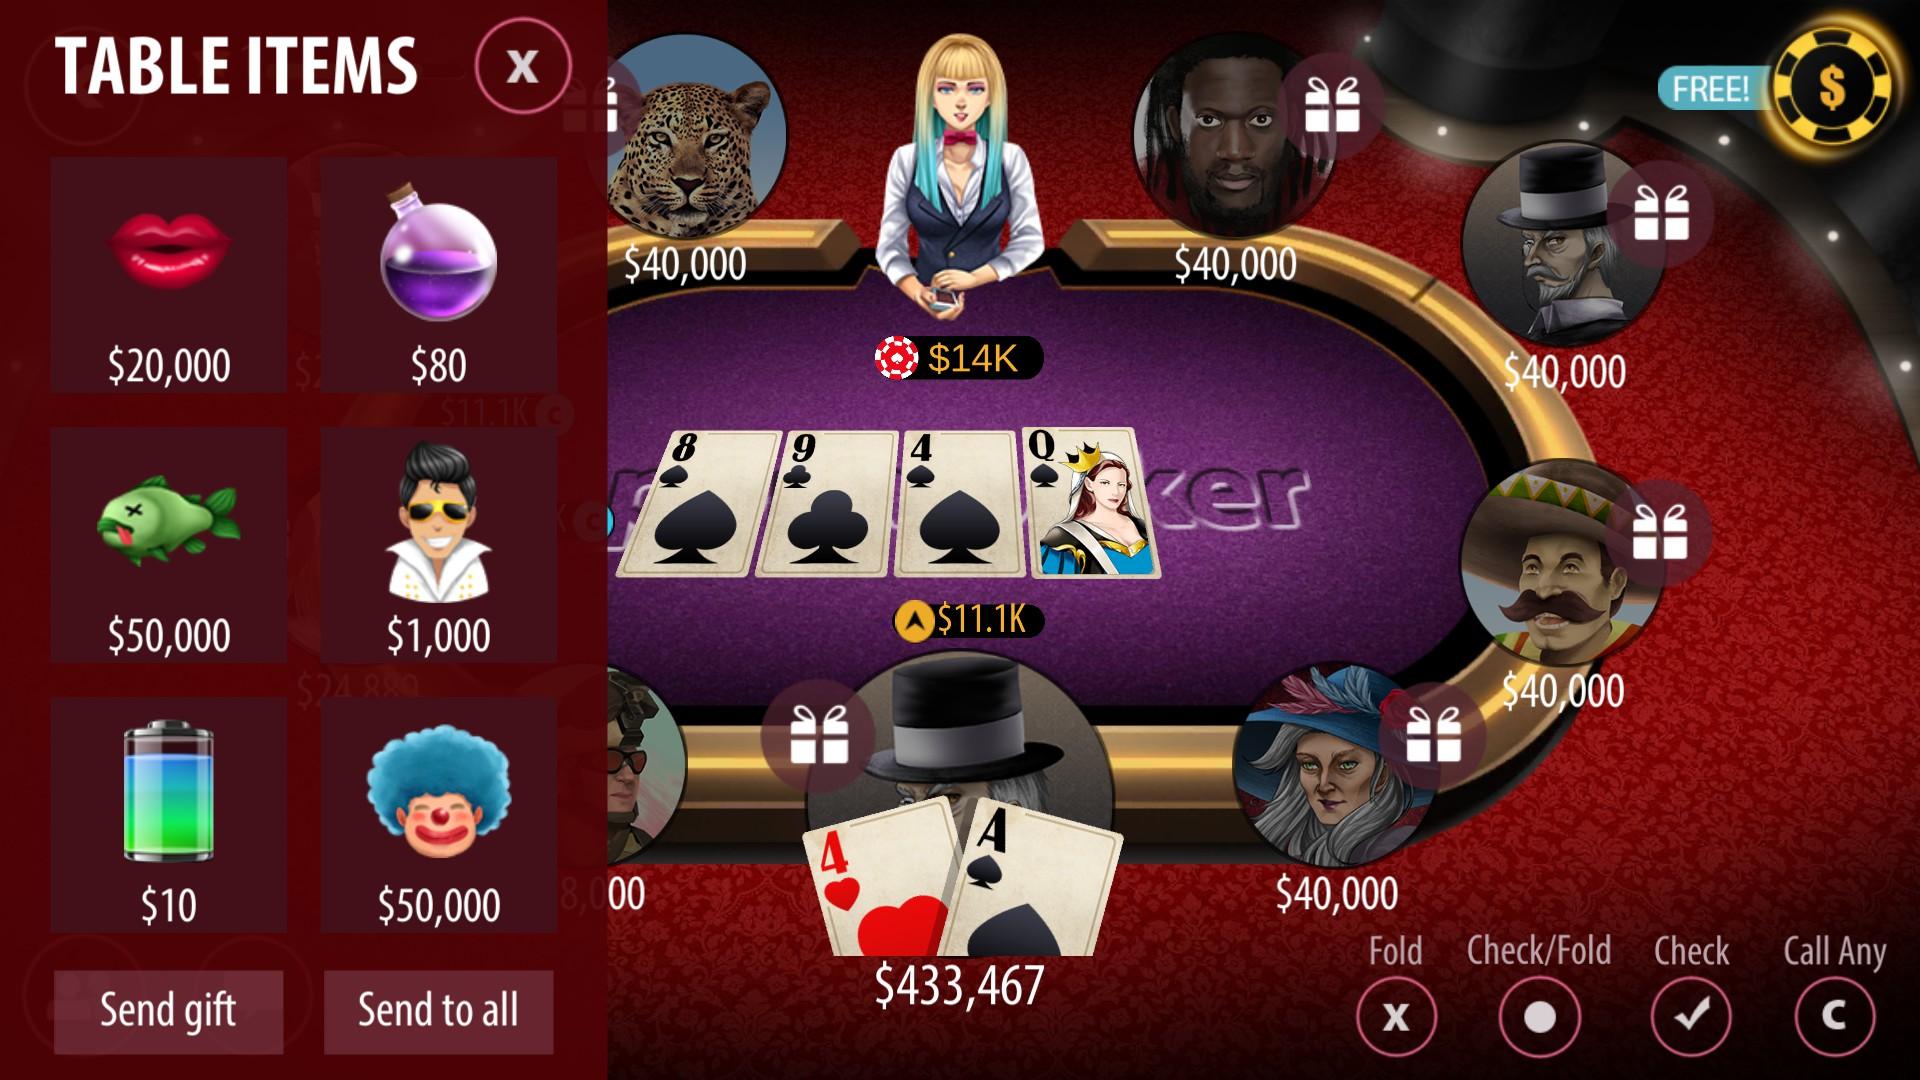 Игры покер онлайн бесплатно флеш заработок на играх онлайн казино